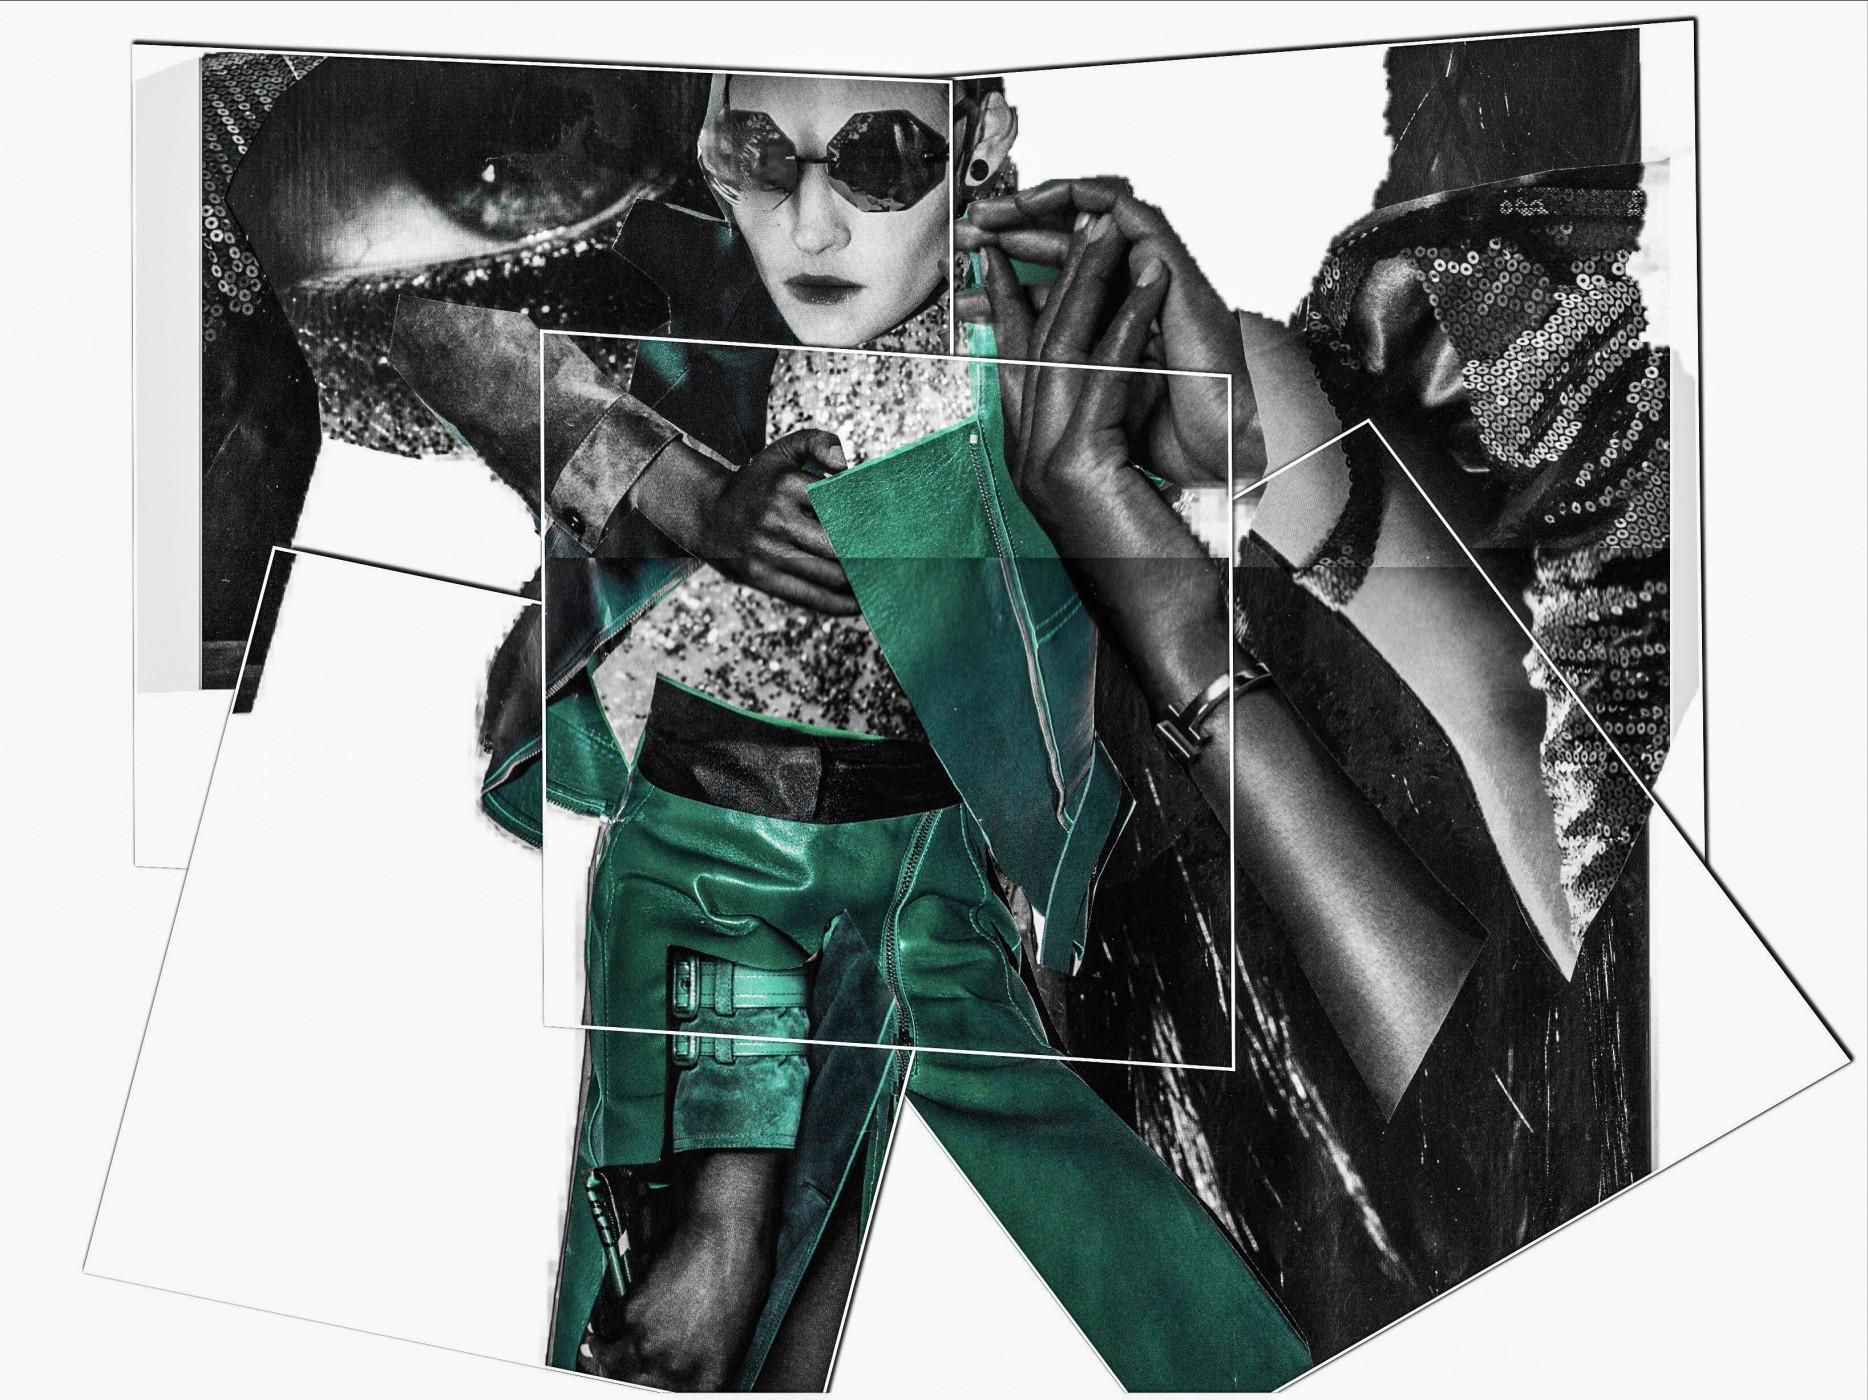 Minefield of eco fashion